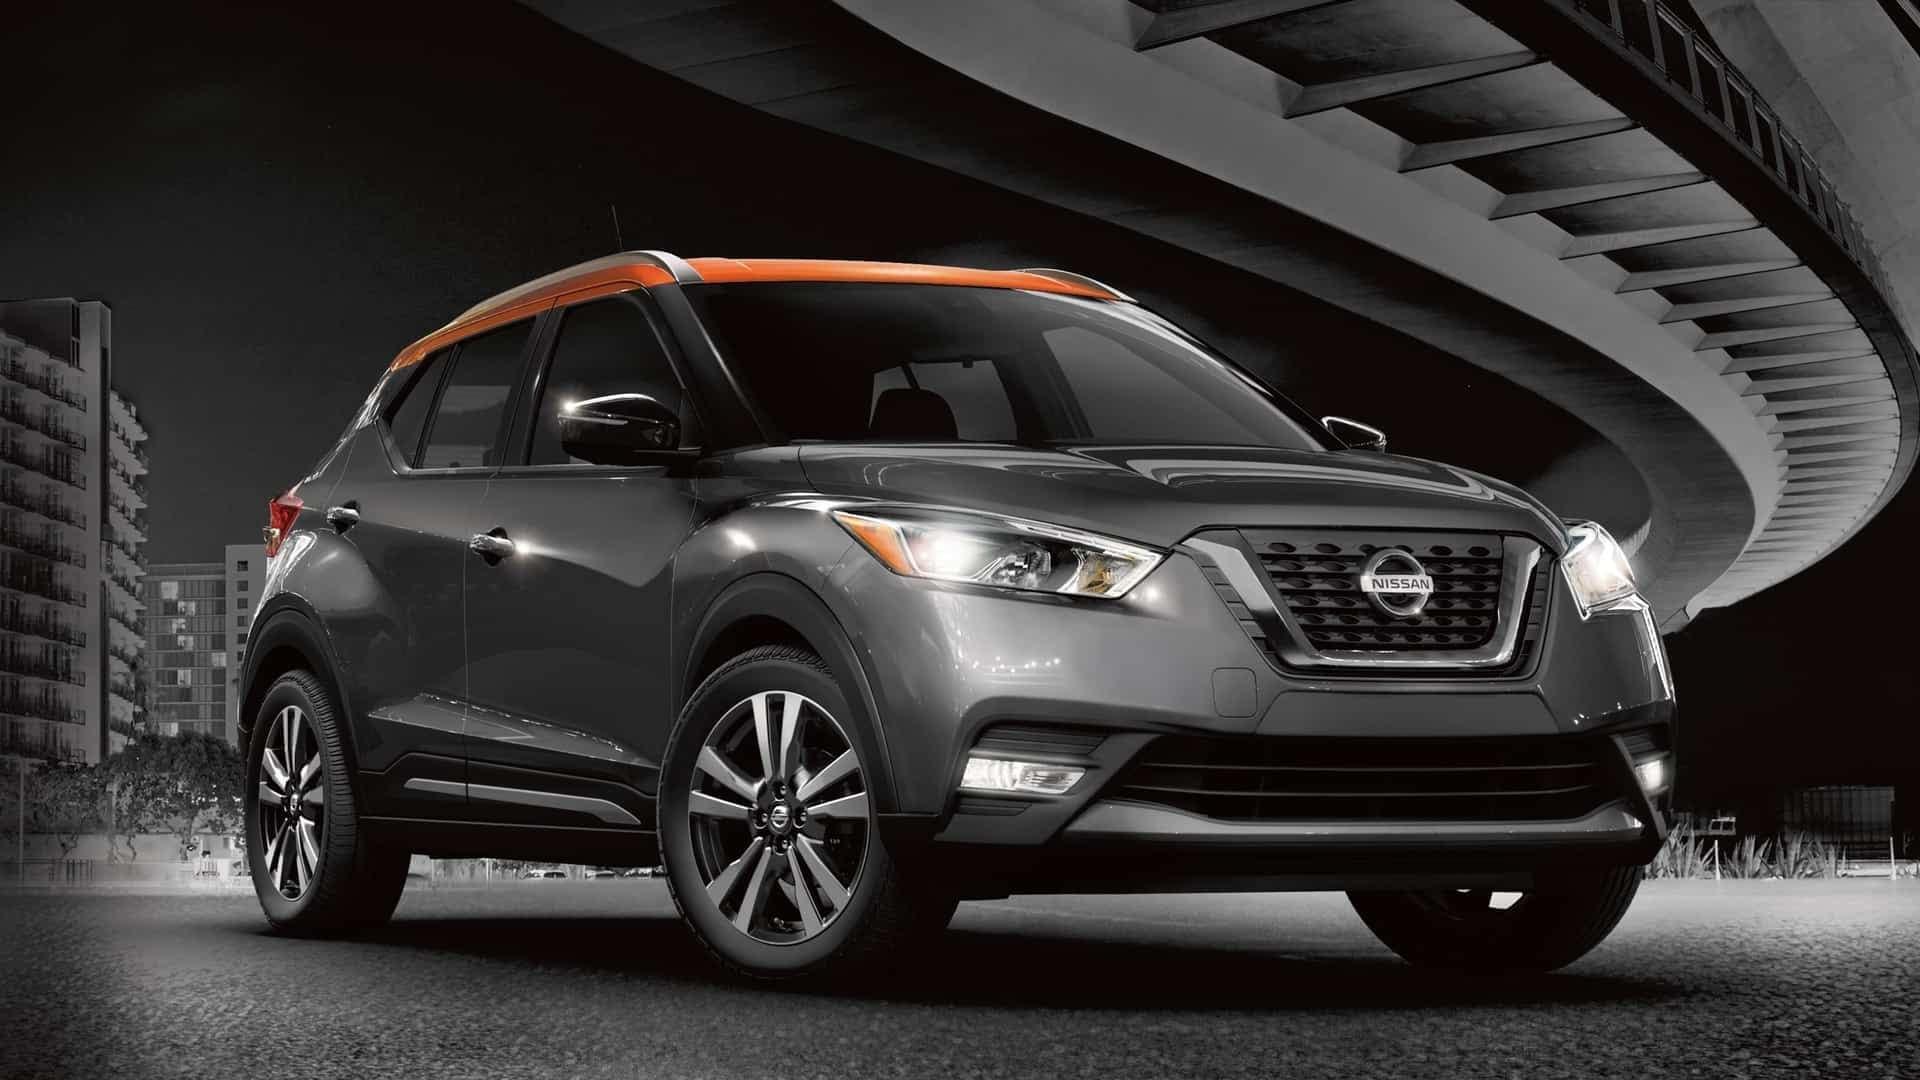 Purchase a SUV Online 2020 Nissan Kicks Near Boerne TX